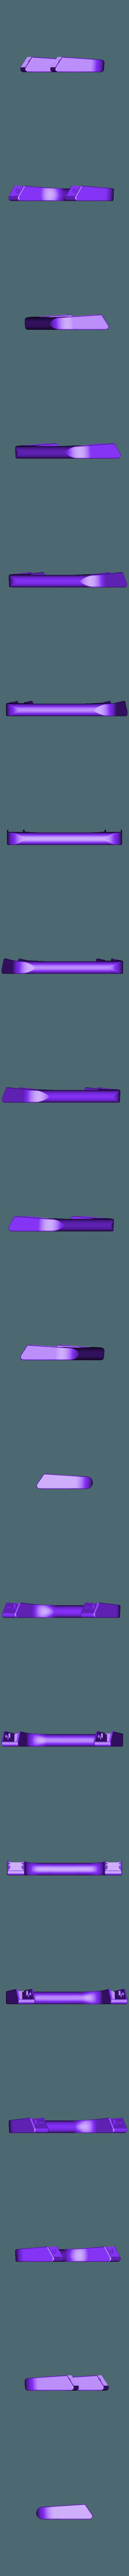 PoigneeMiele.stl Download free STL file MIELE fridge handle replacement part • Model to 3D print, uhgues